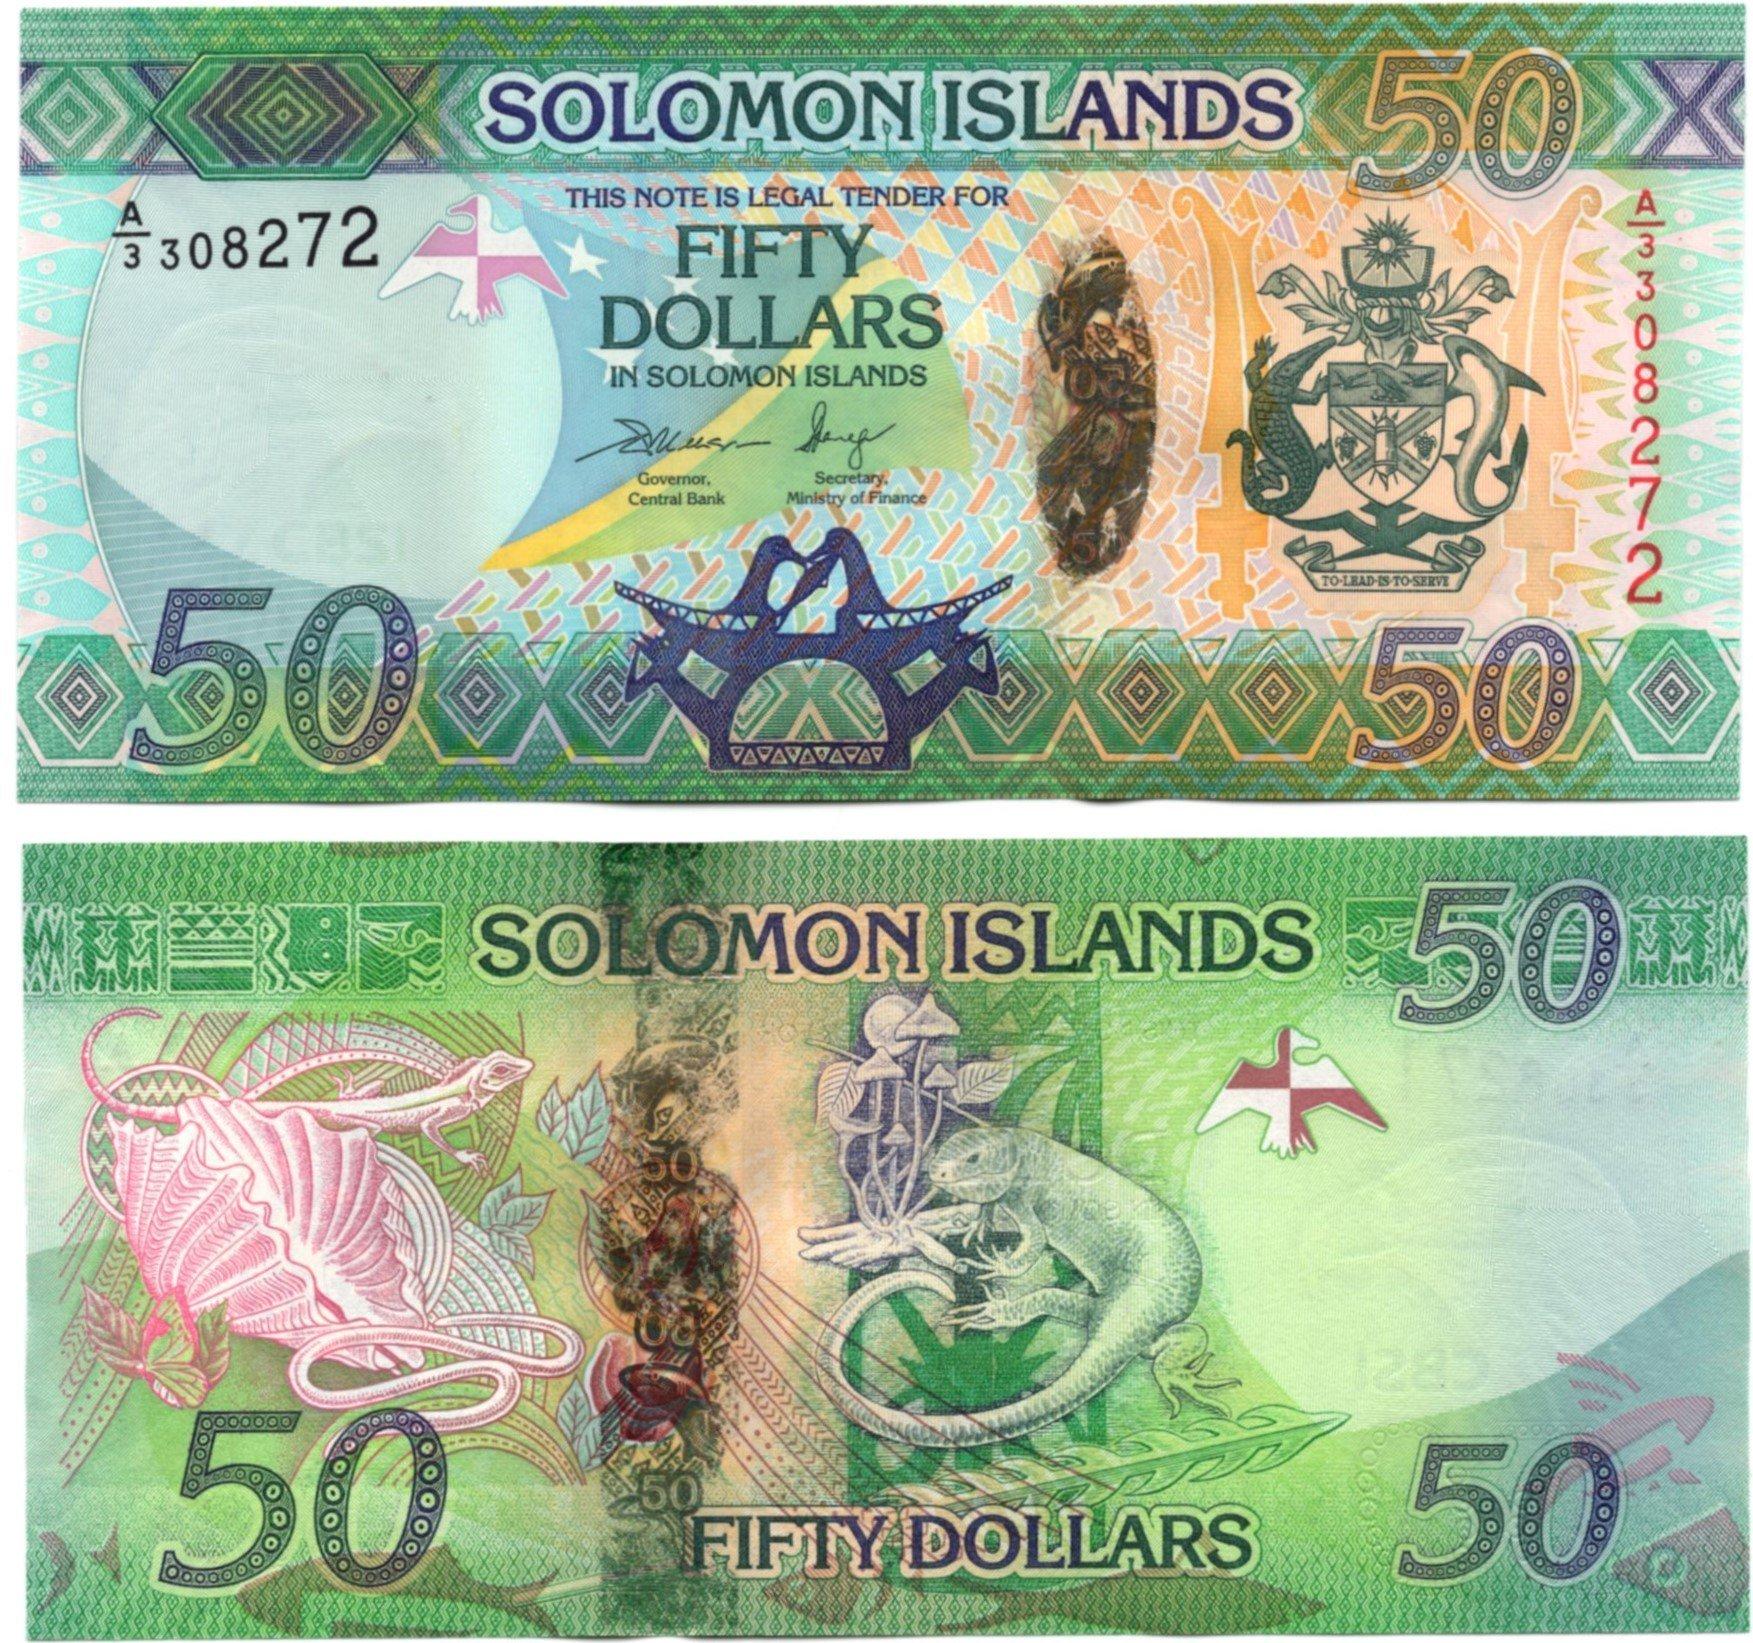 Solomon Islands 50 dollars hybrid polymer